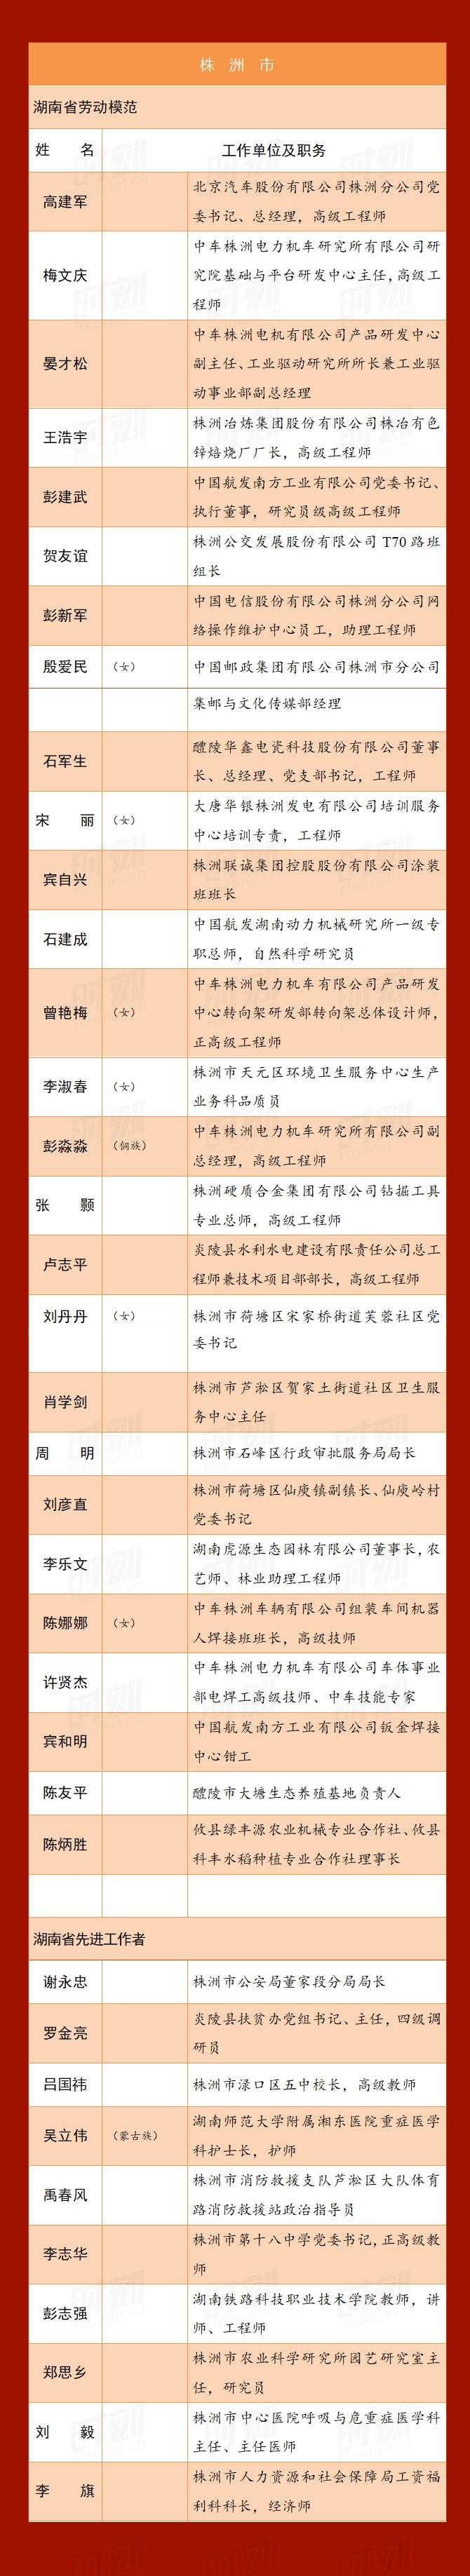 a3株洲_r1_c1.jpg